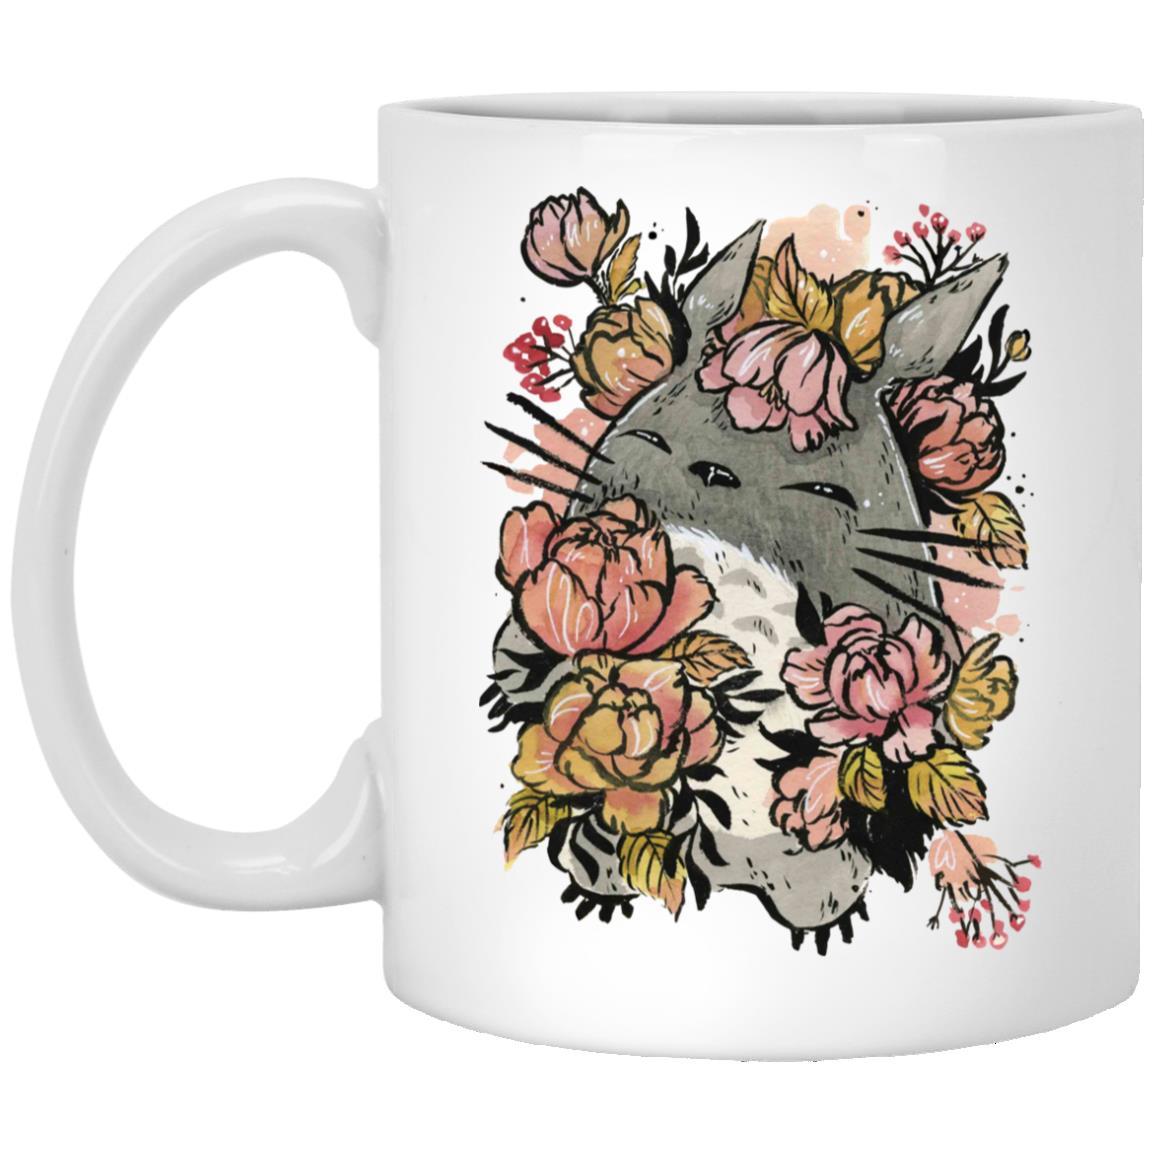 Totoro by the Flowers Mug